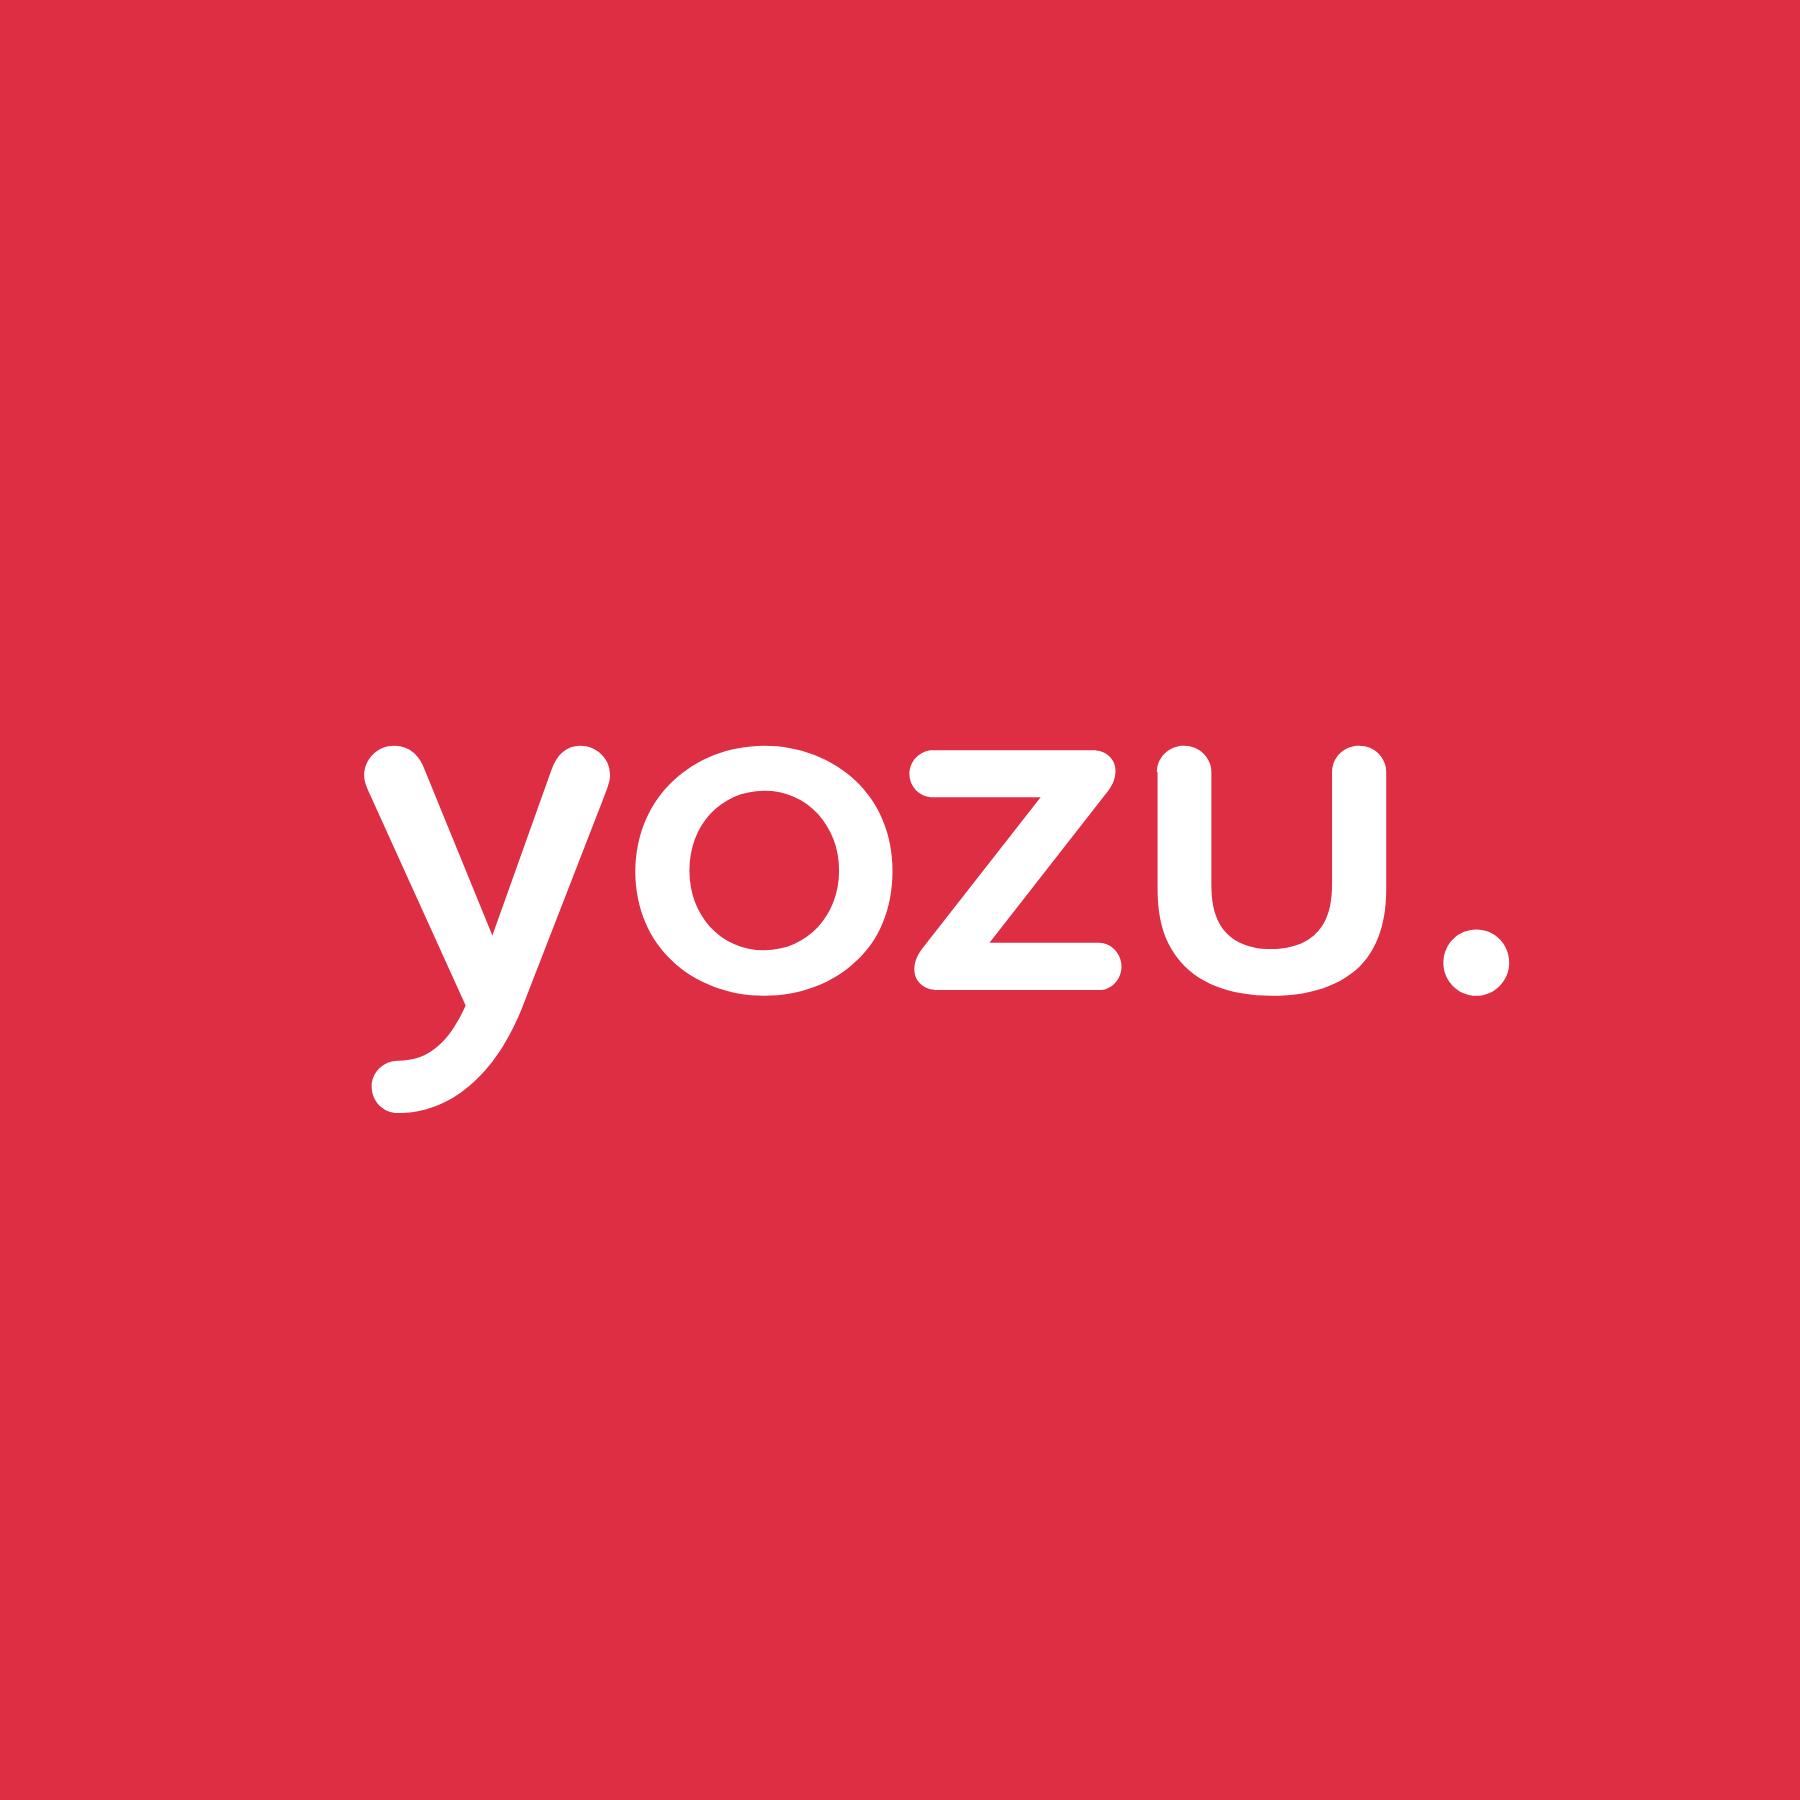 https://yozu.co.uk Logo